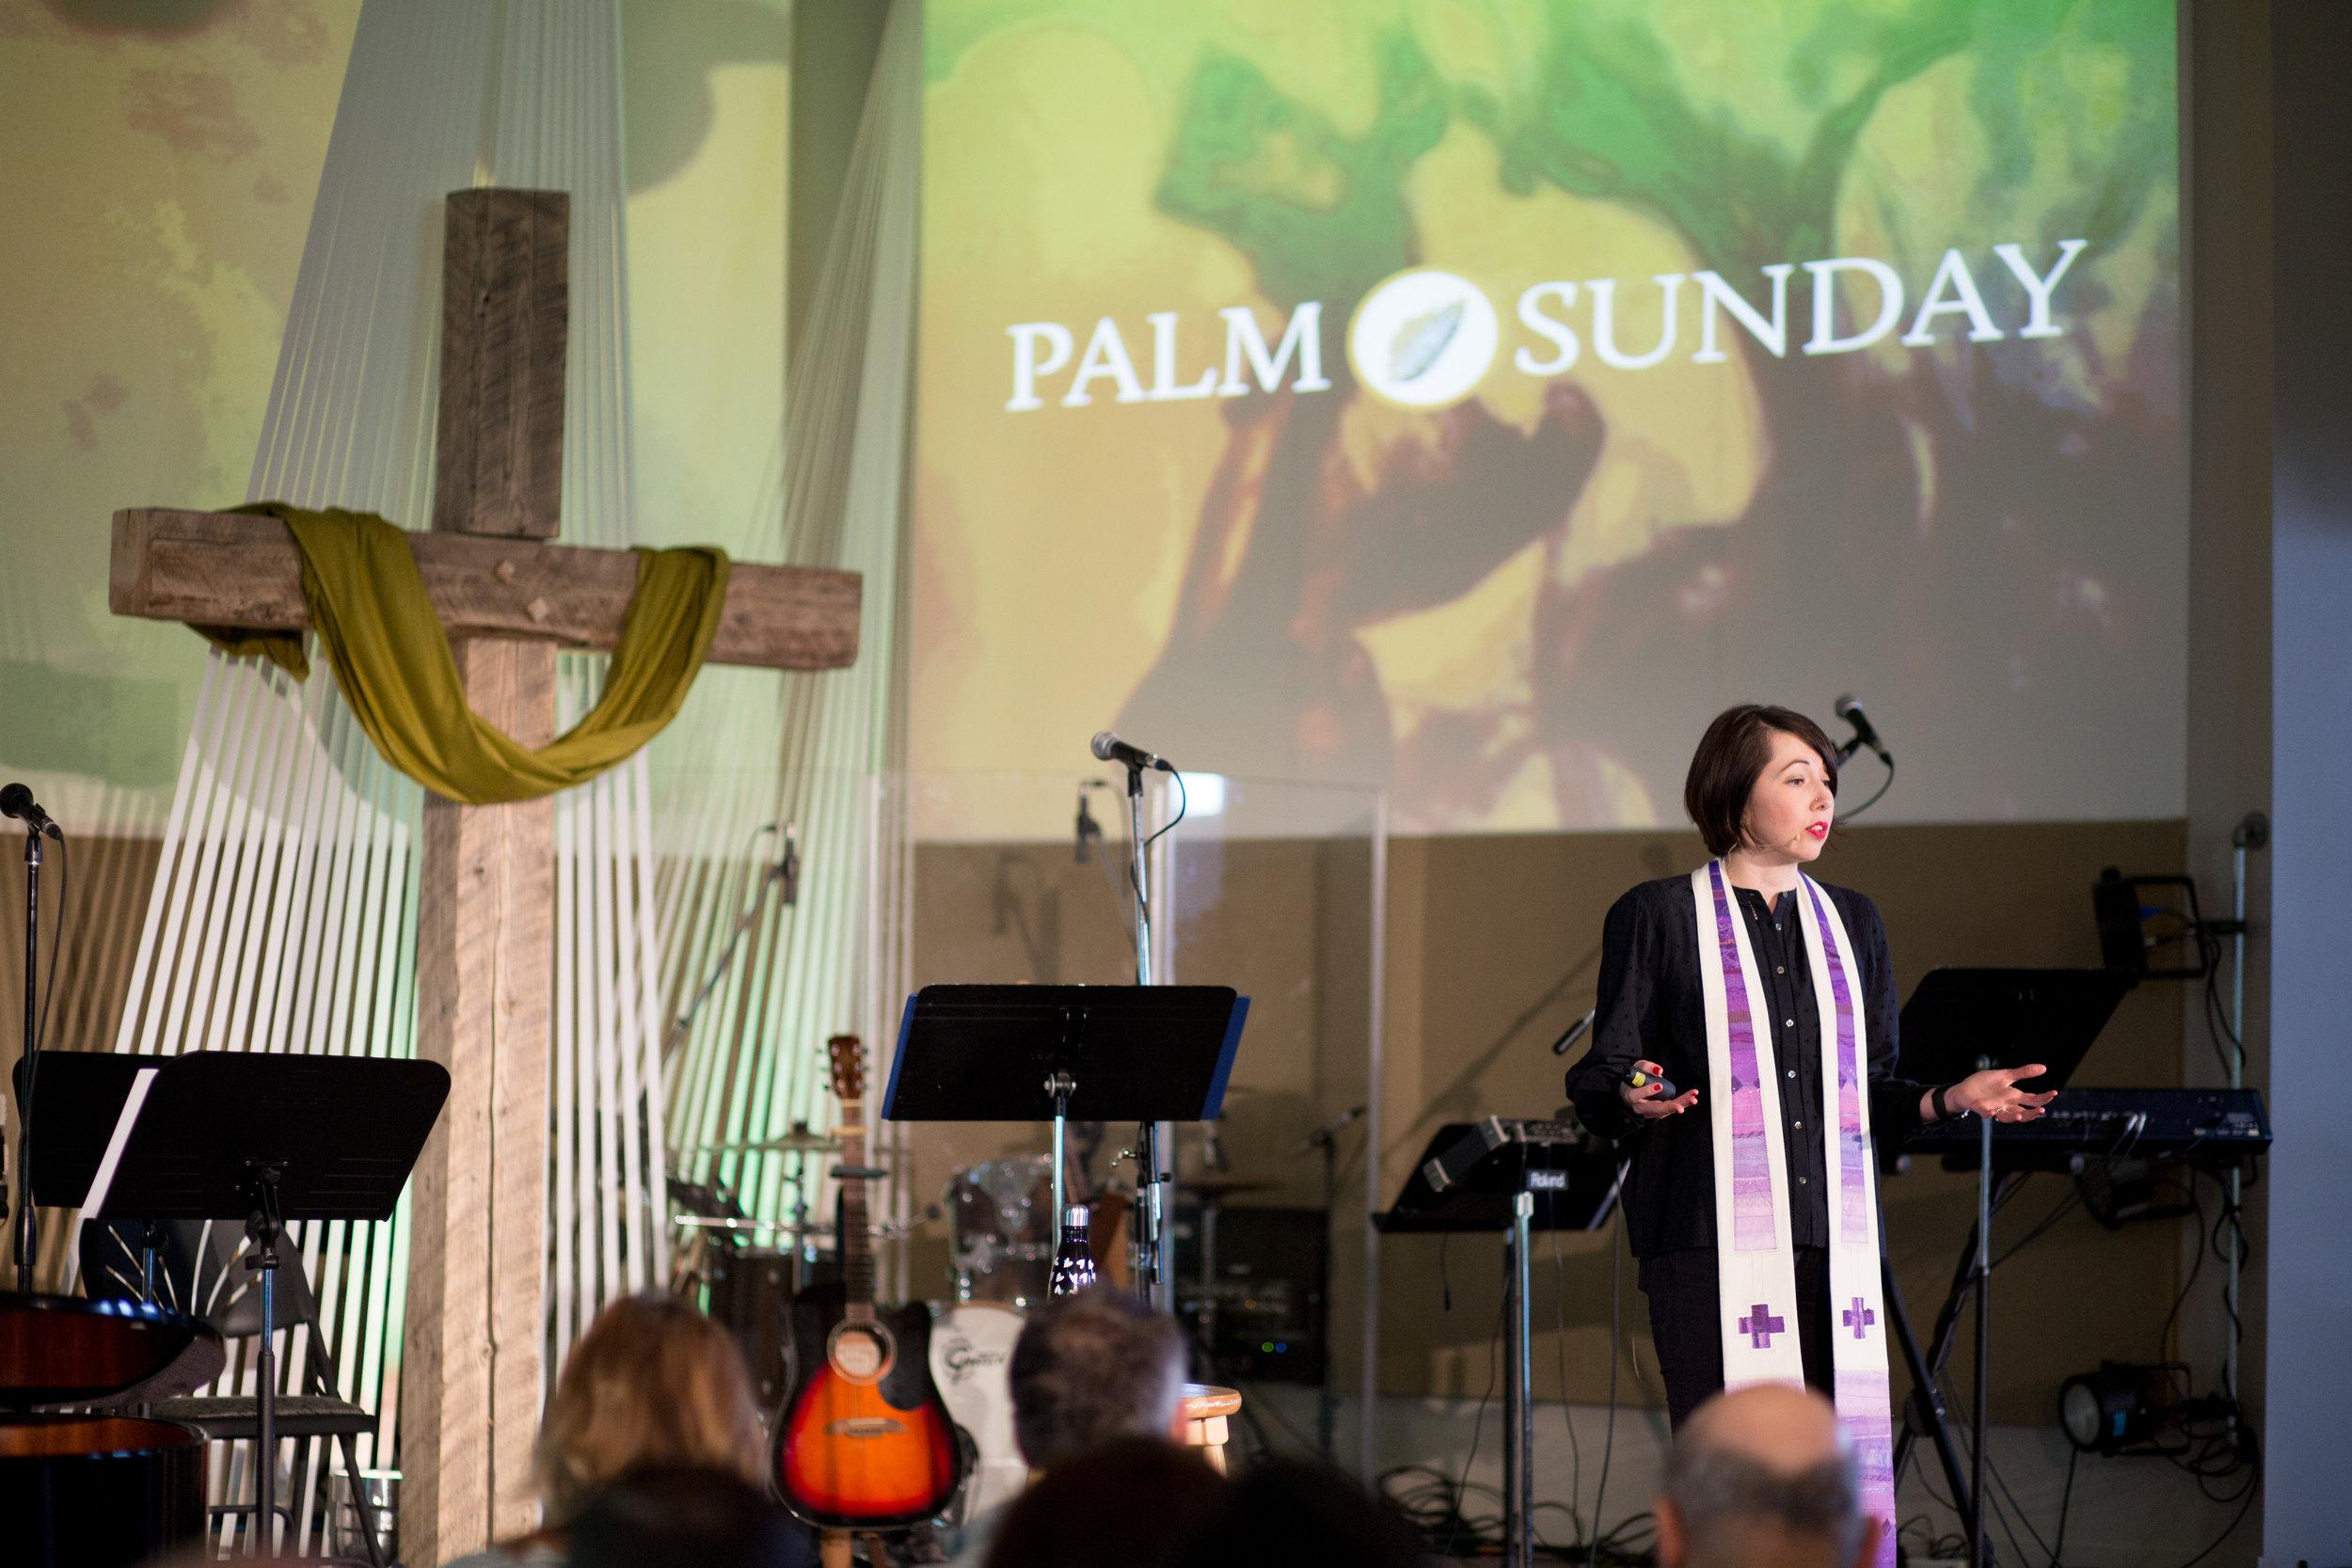 20170409 Commons Palm Sunday LJ 0321.jpg